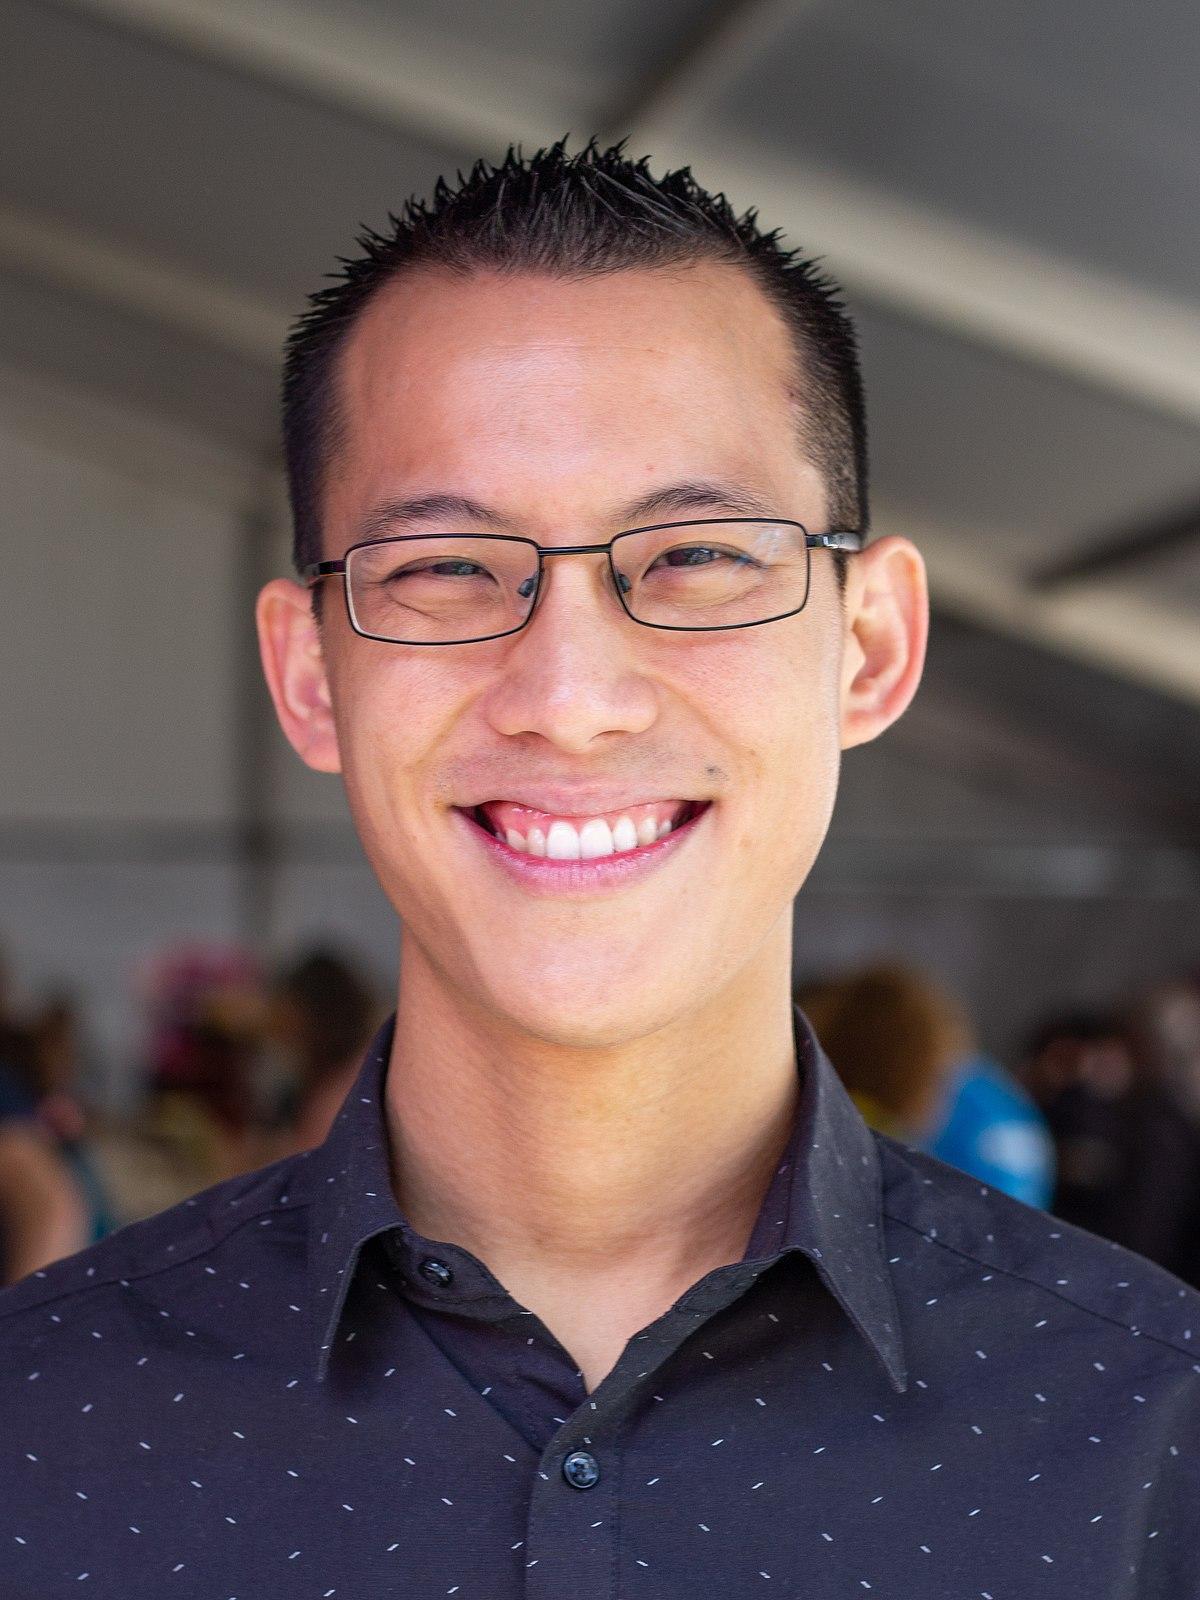 Eddie Woo - Wikipedia